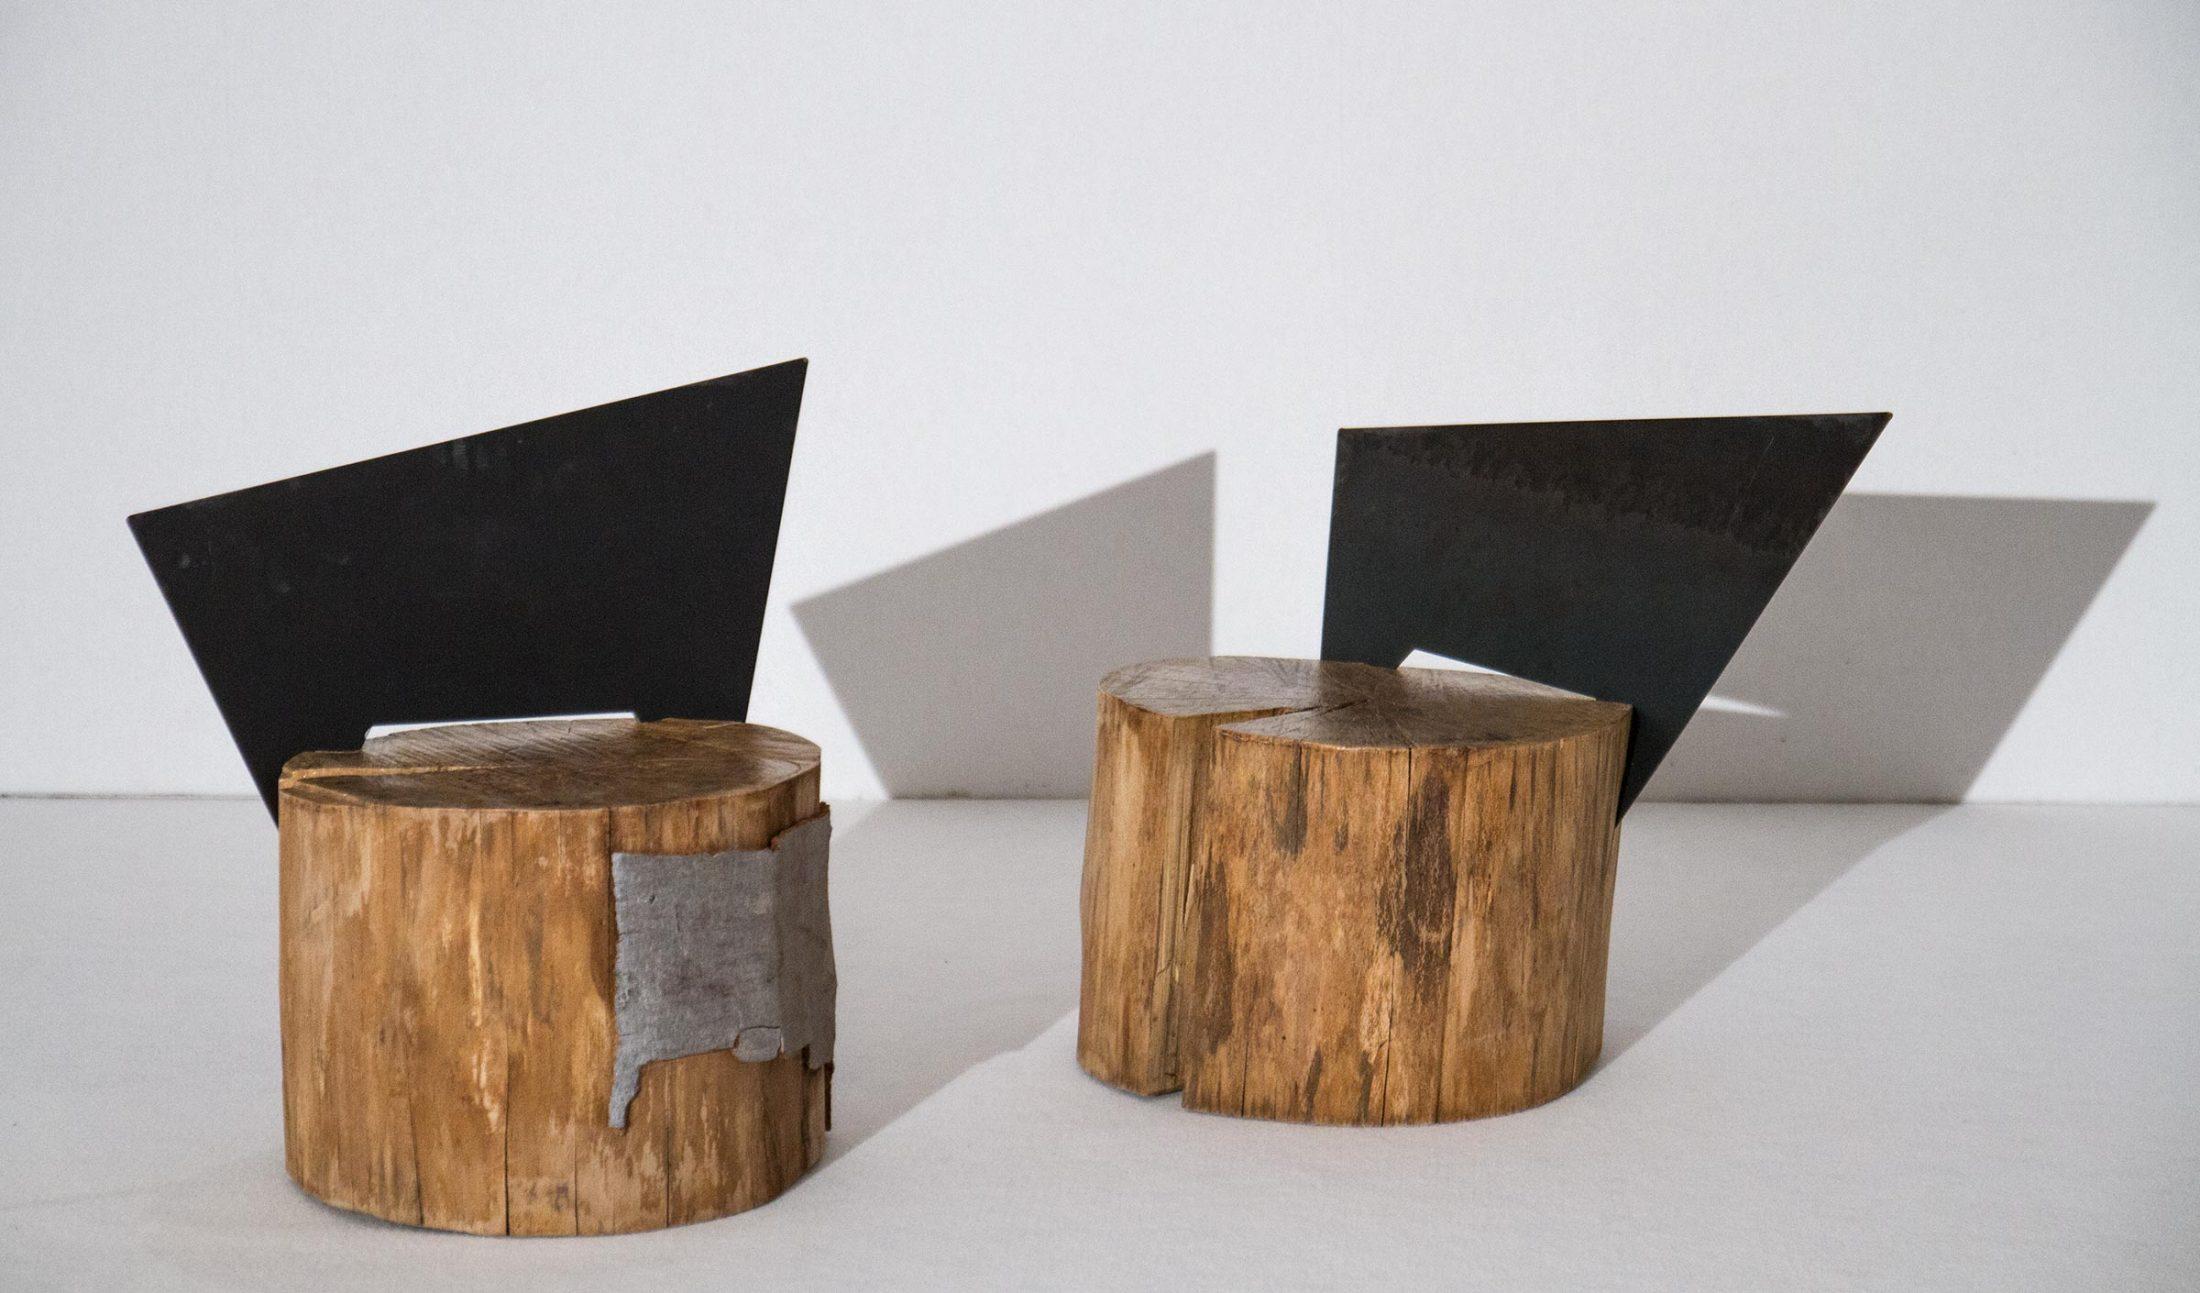 Chair concept Design Liviana Osti per Animal Spirits Concept Store